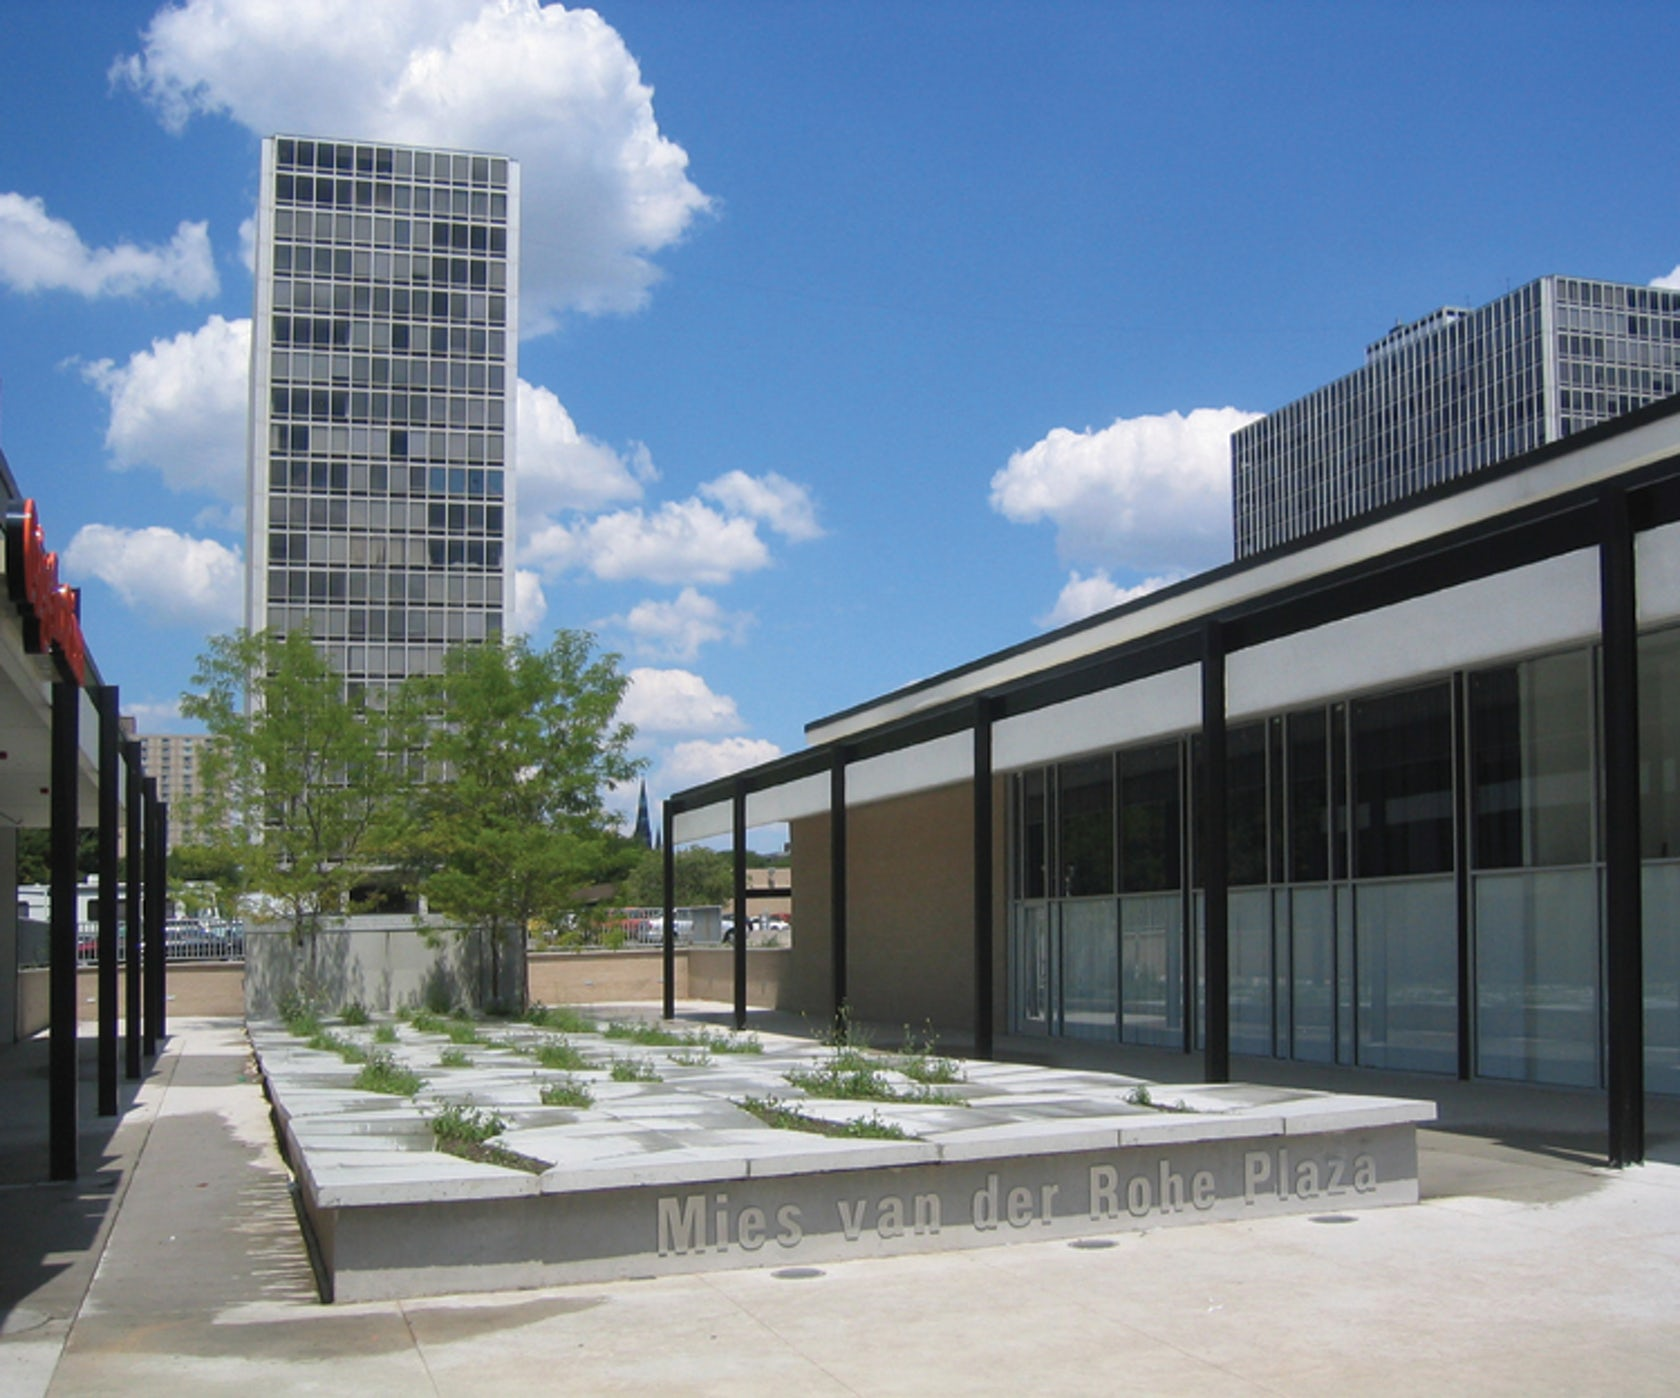 Mies Van Der Rohe Plaza